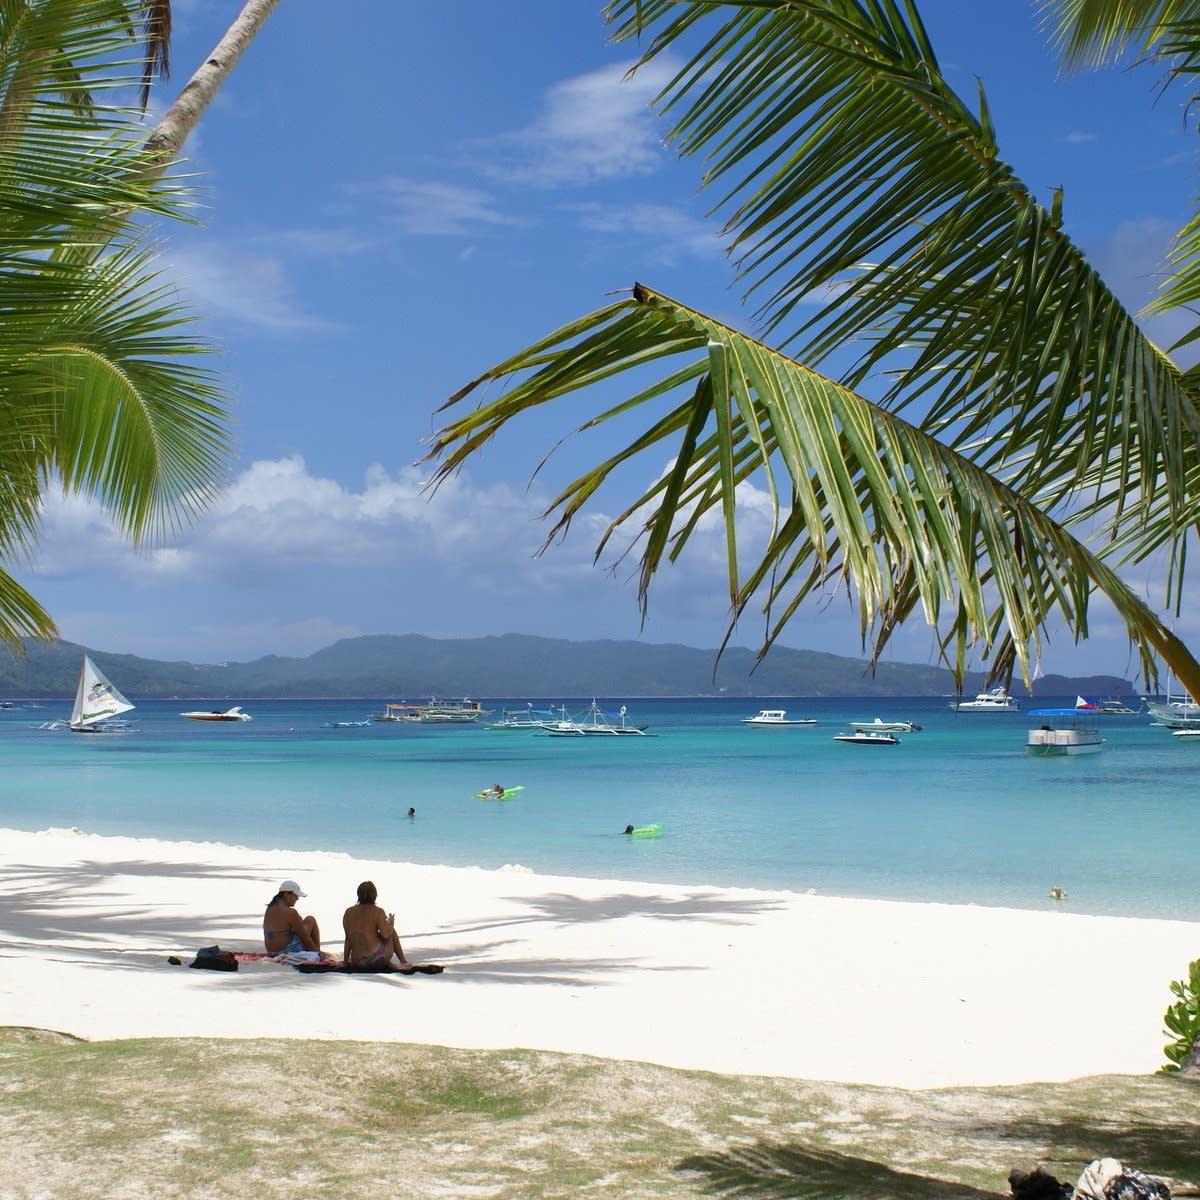 Beach vacation scene